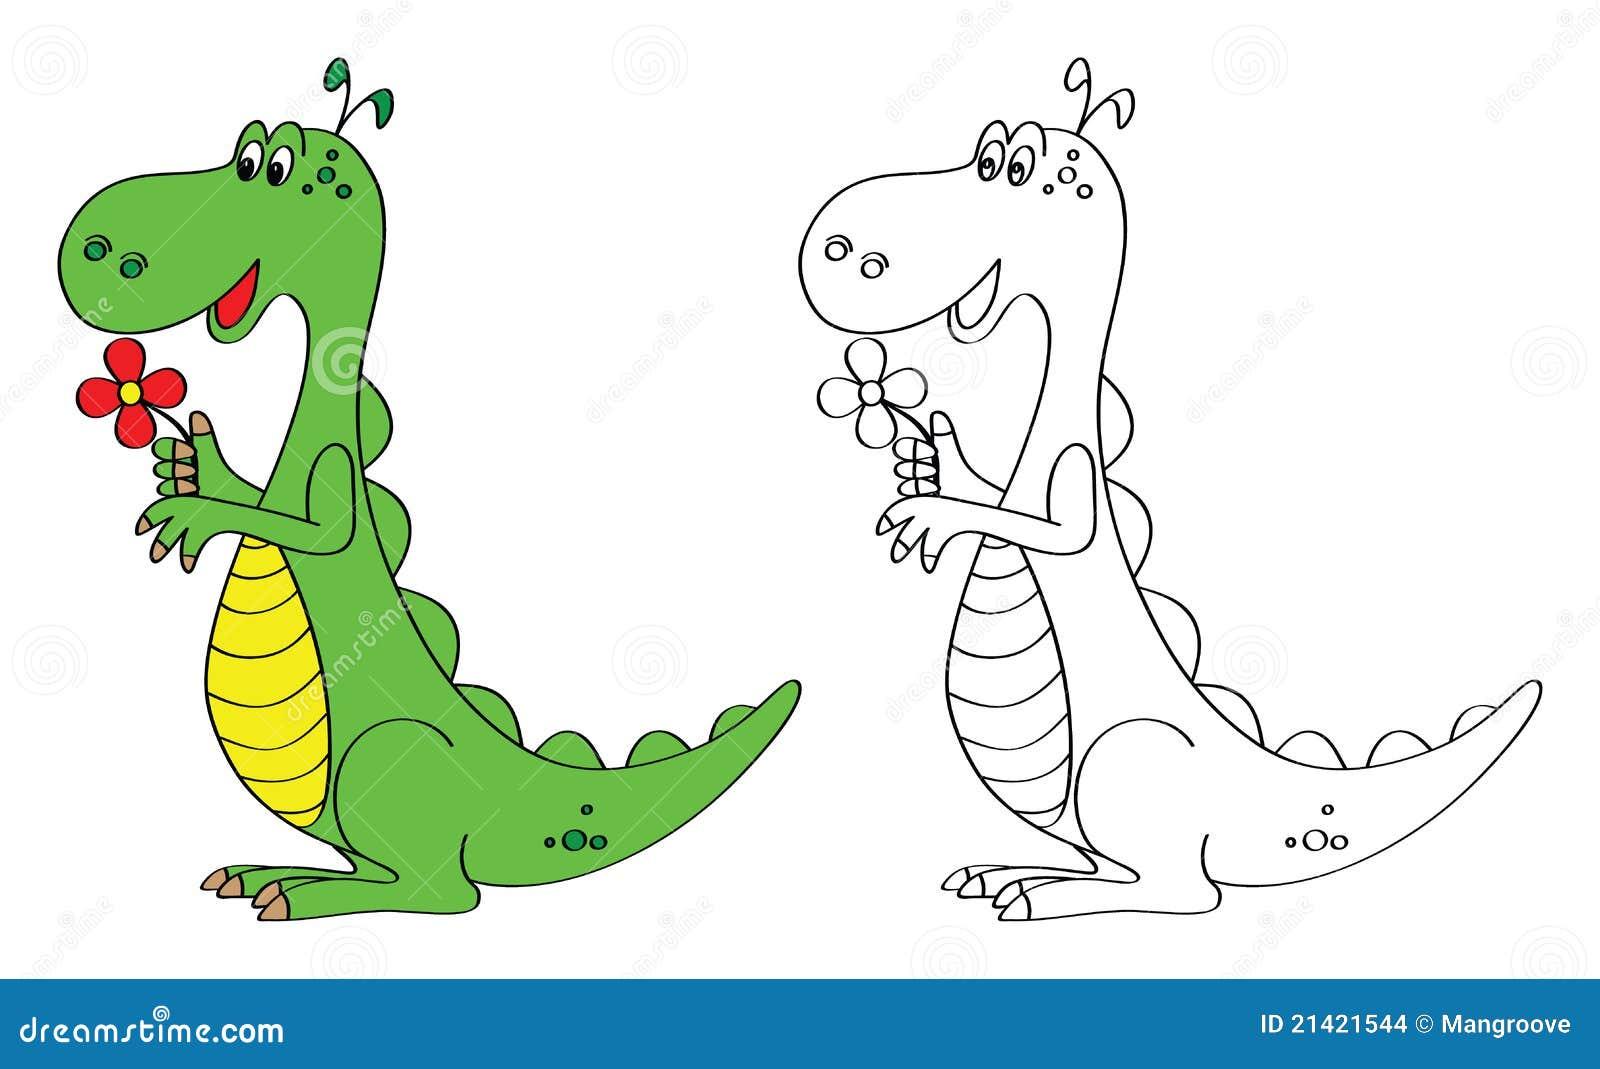 coloring-book-page-kids-dinosaur-21421544